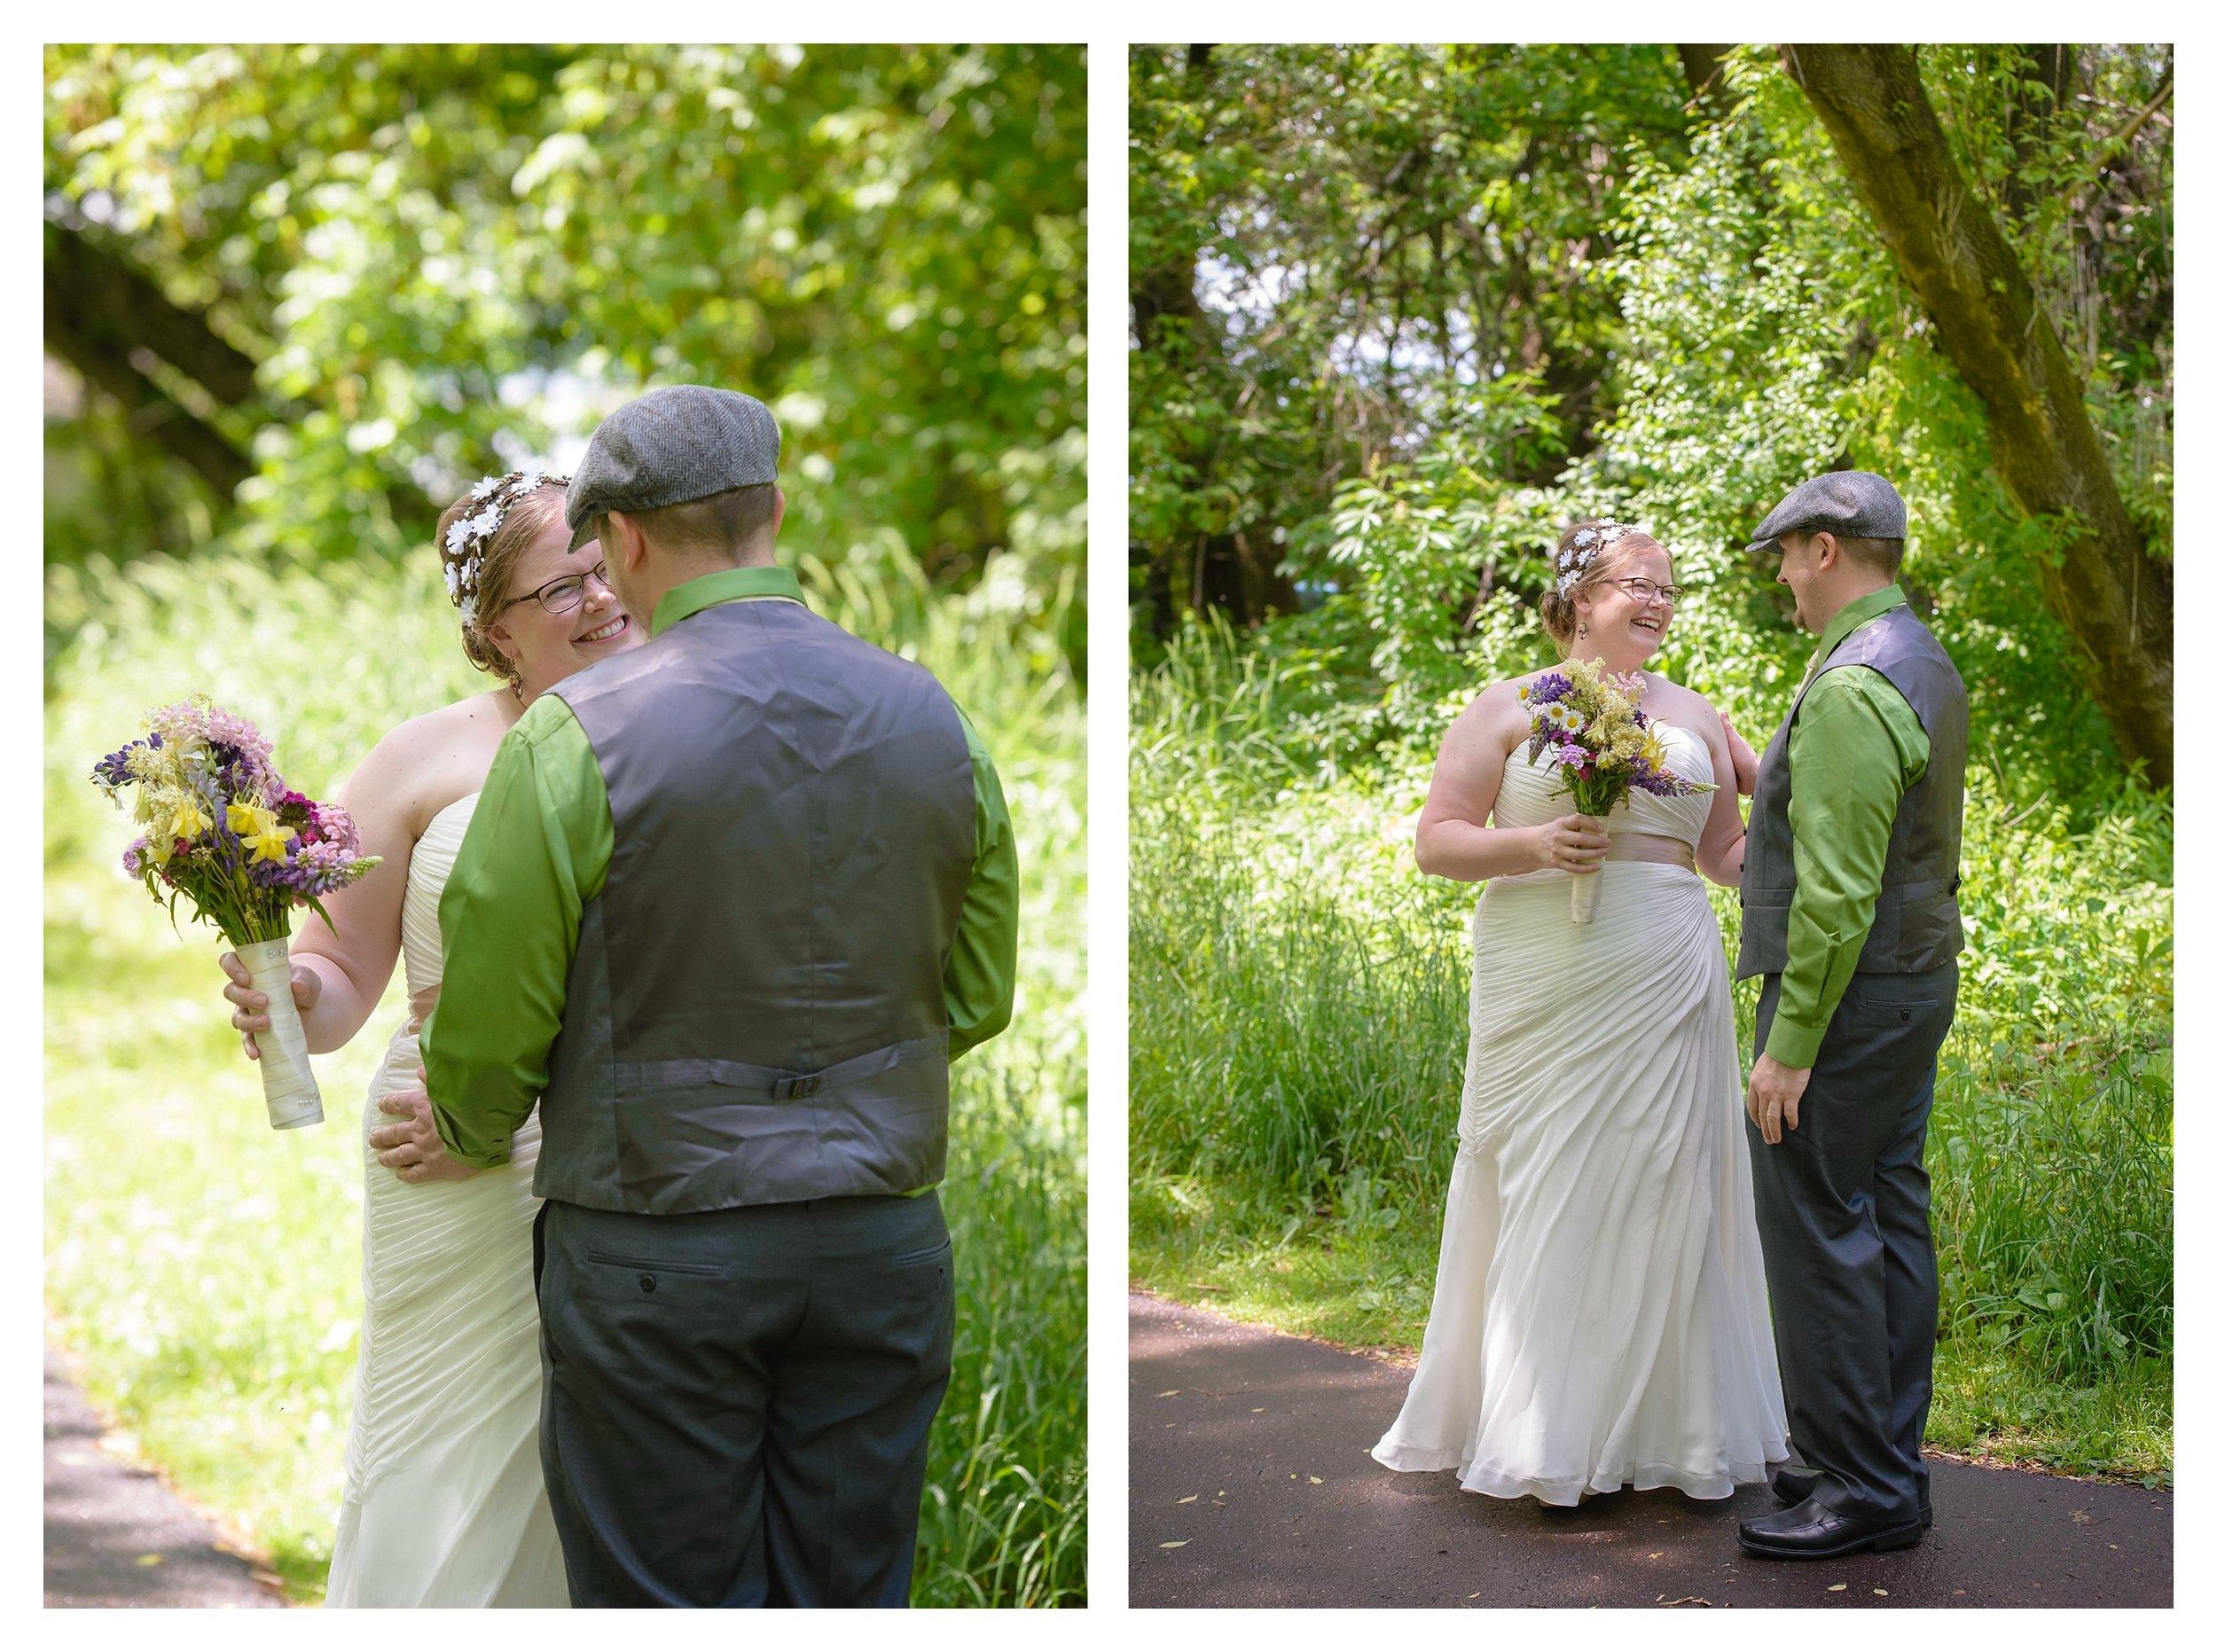 ashland oredock northwoods wisconsin wedding ps 139 photography_0275.jpg